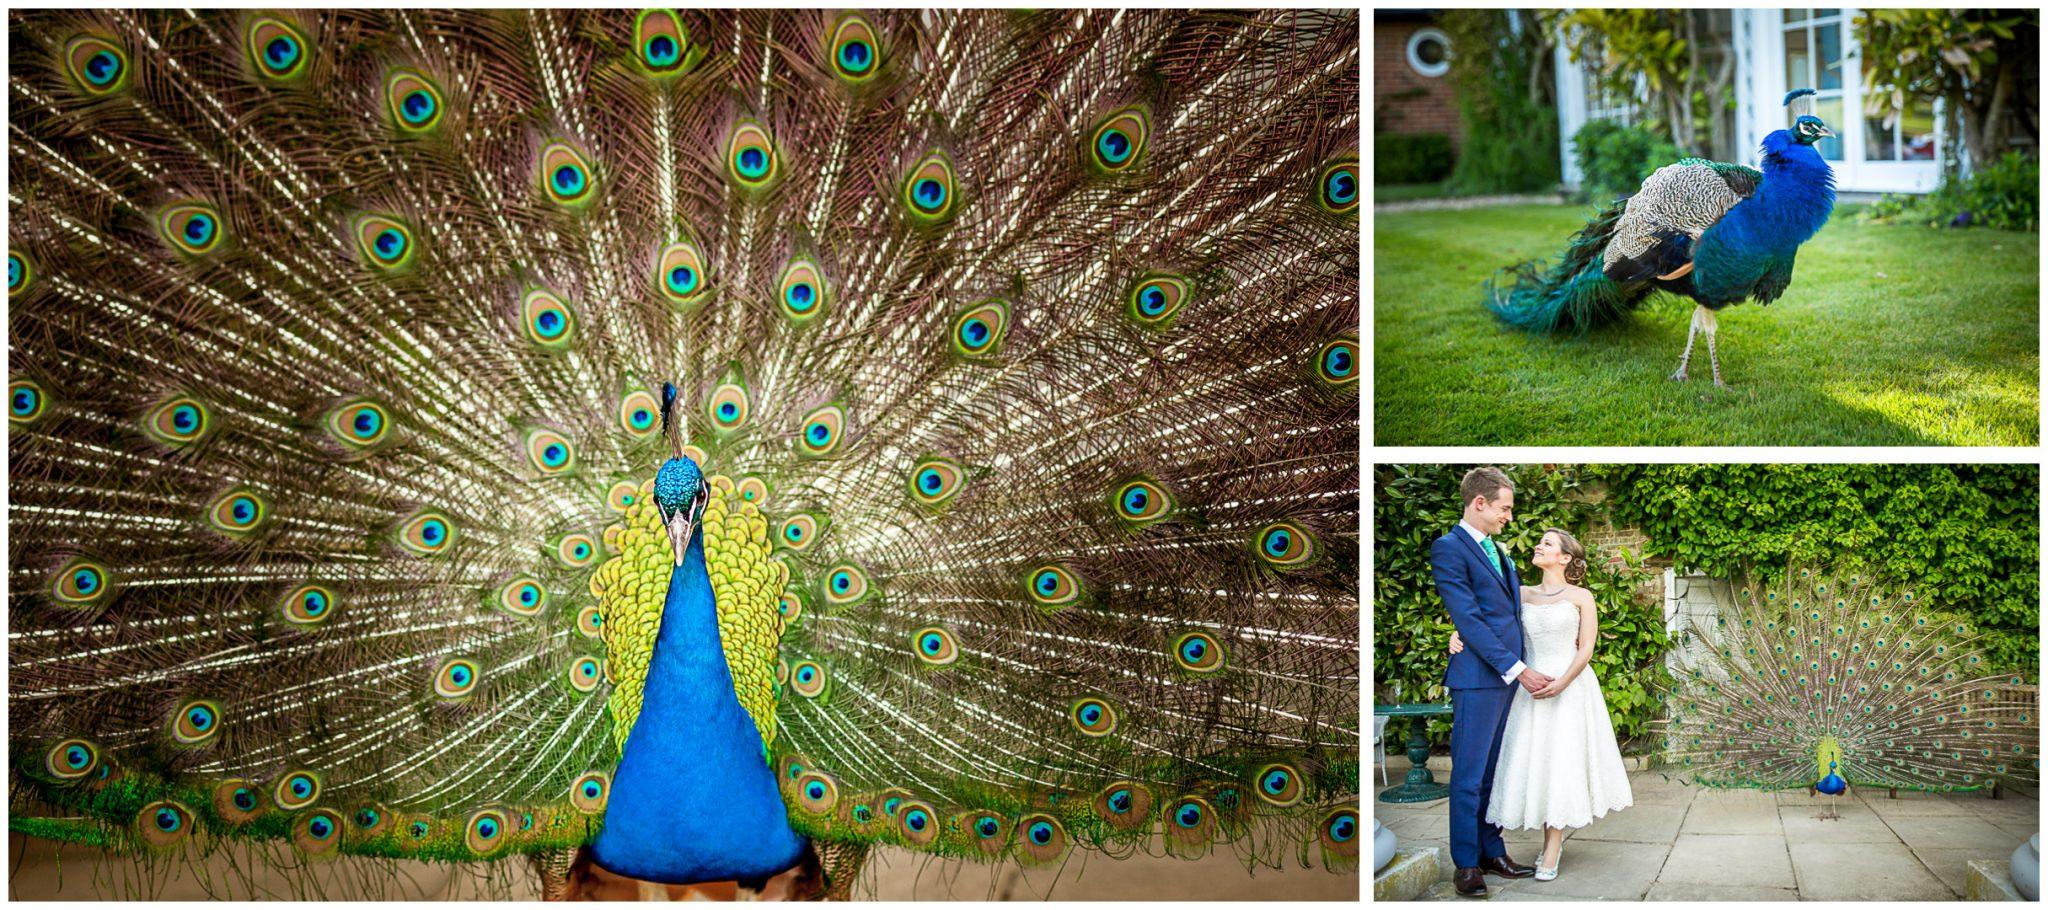 Avington Park wedding photography peacock puts on a display